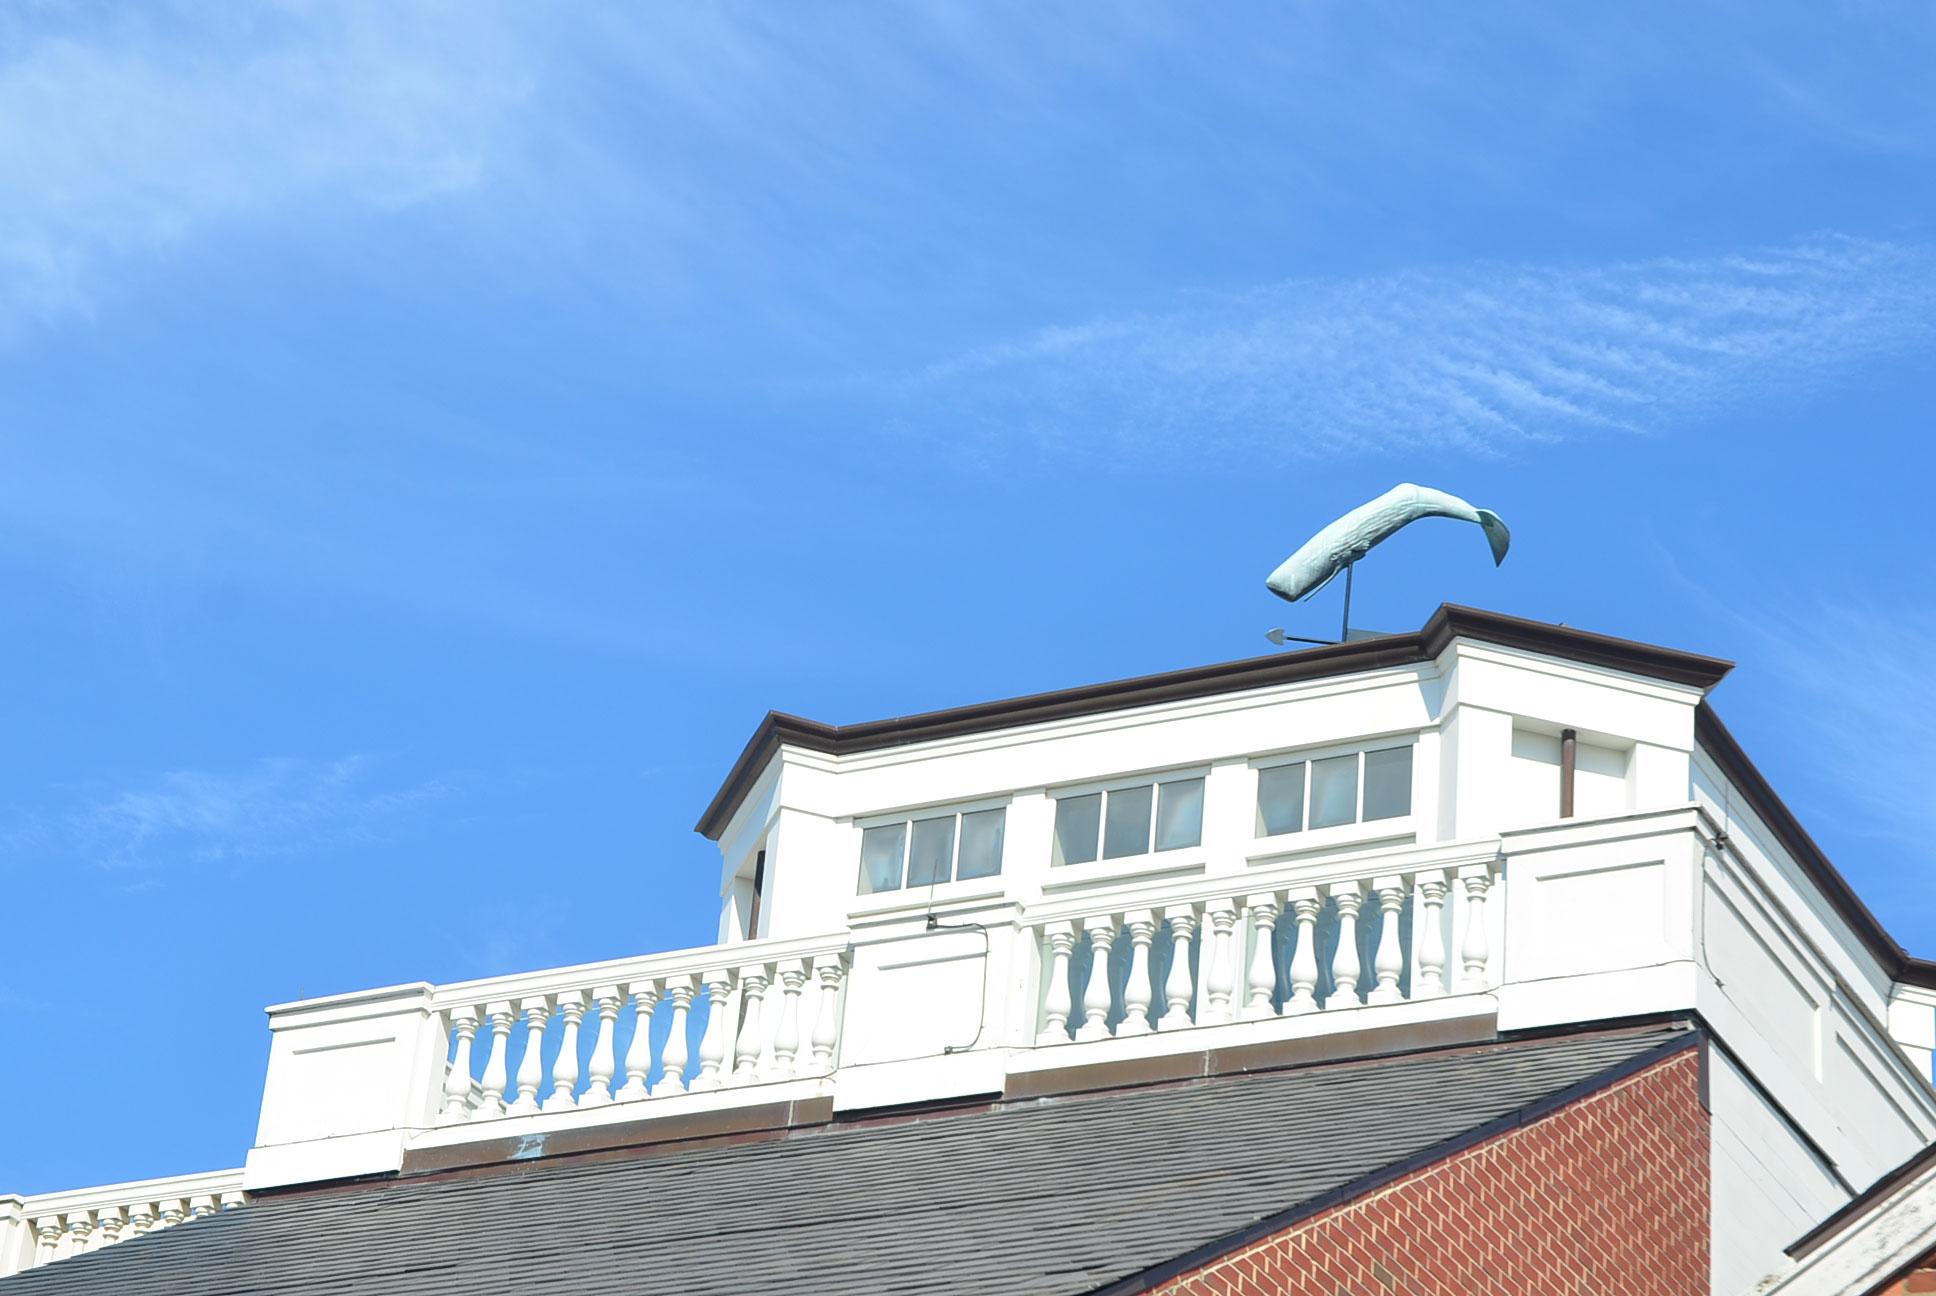 Nantucket Property Caretaking | Wilson Company